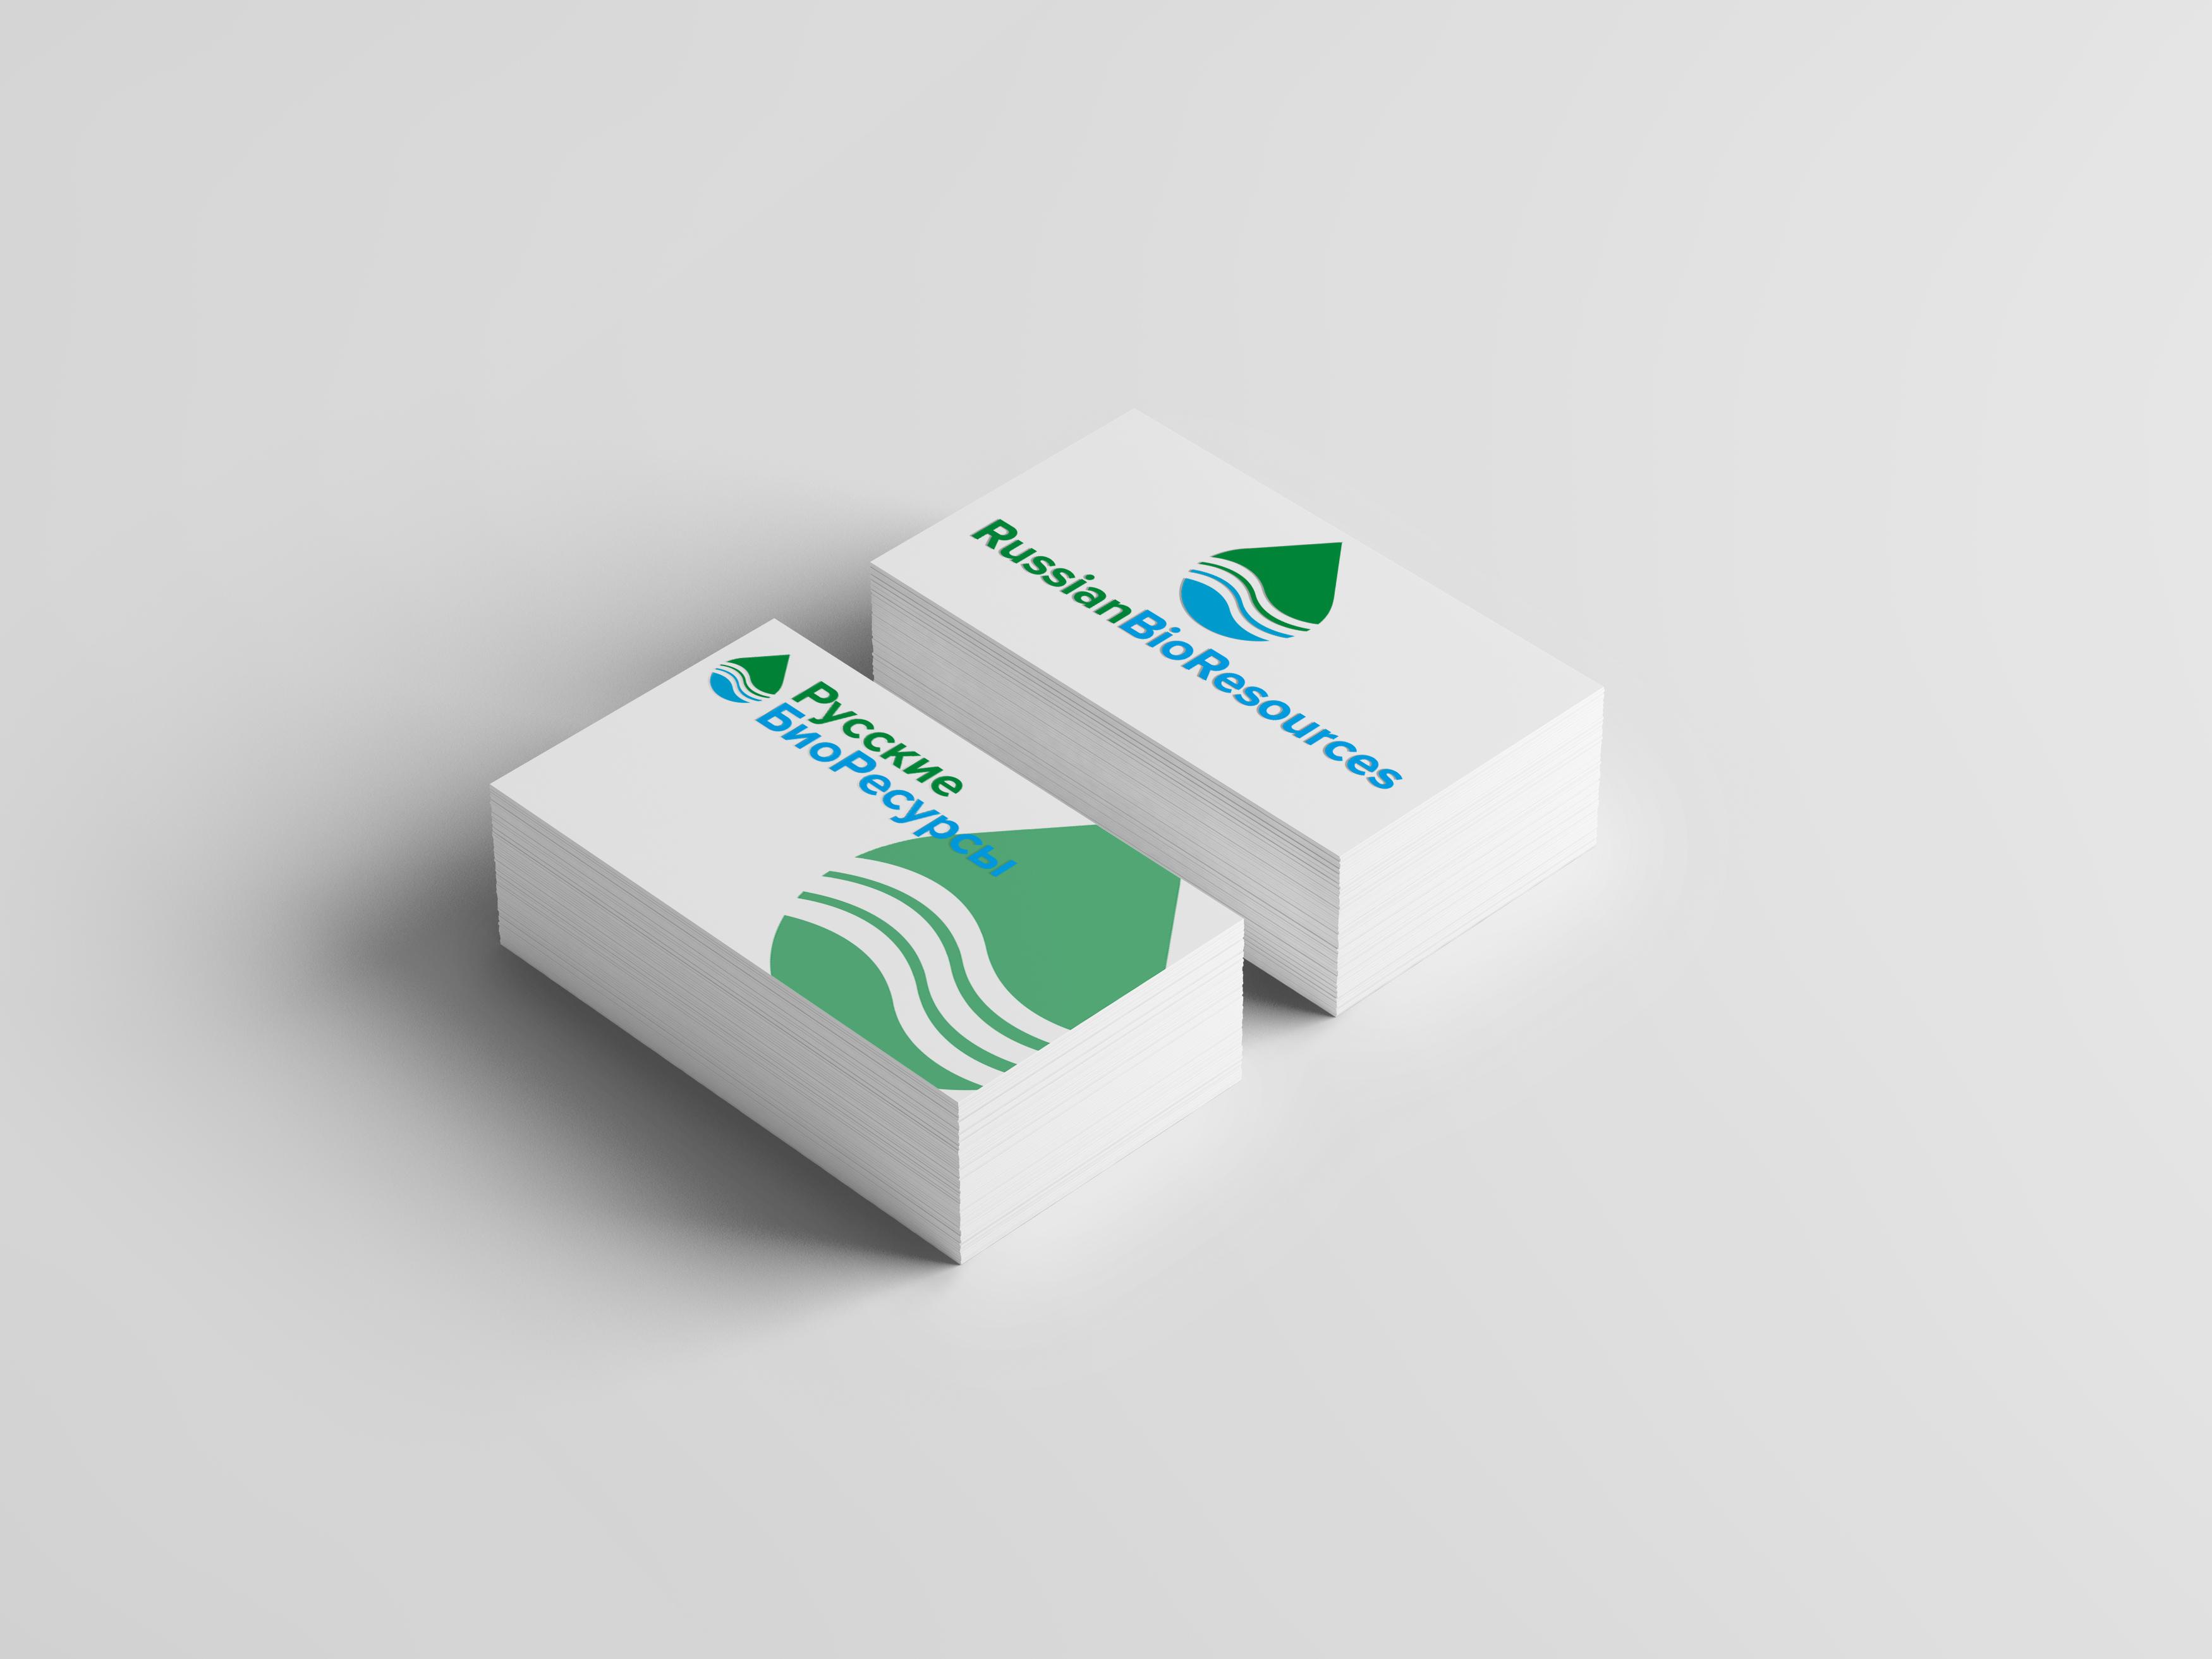 Разработка логотипа для компании «Русские Био Ресурсы» фото f_95858f80bb8e5592.jpg